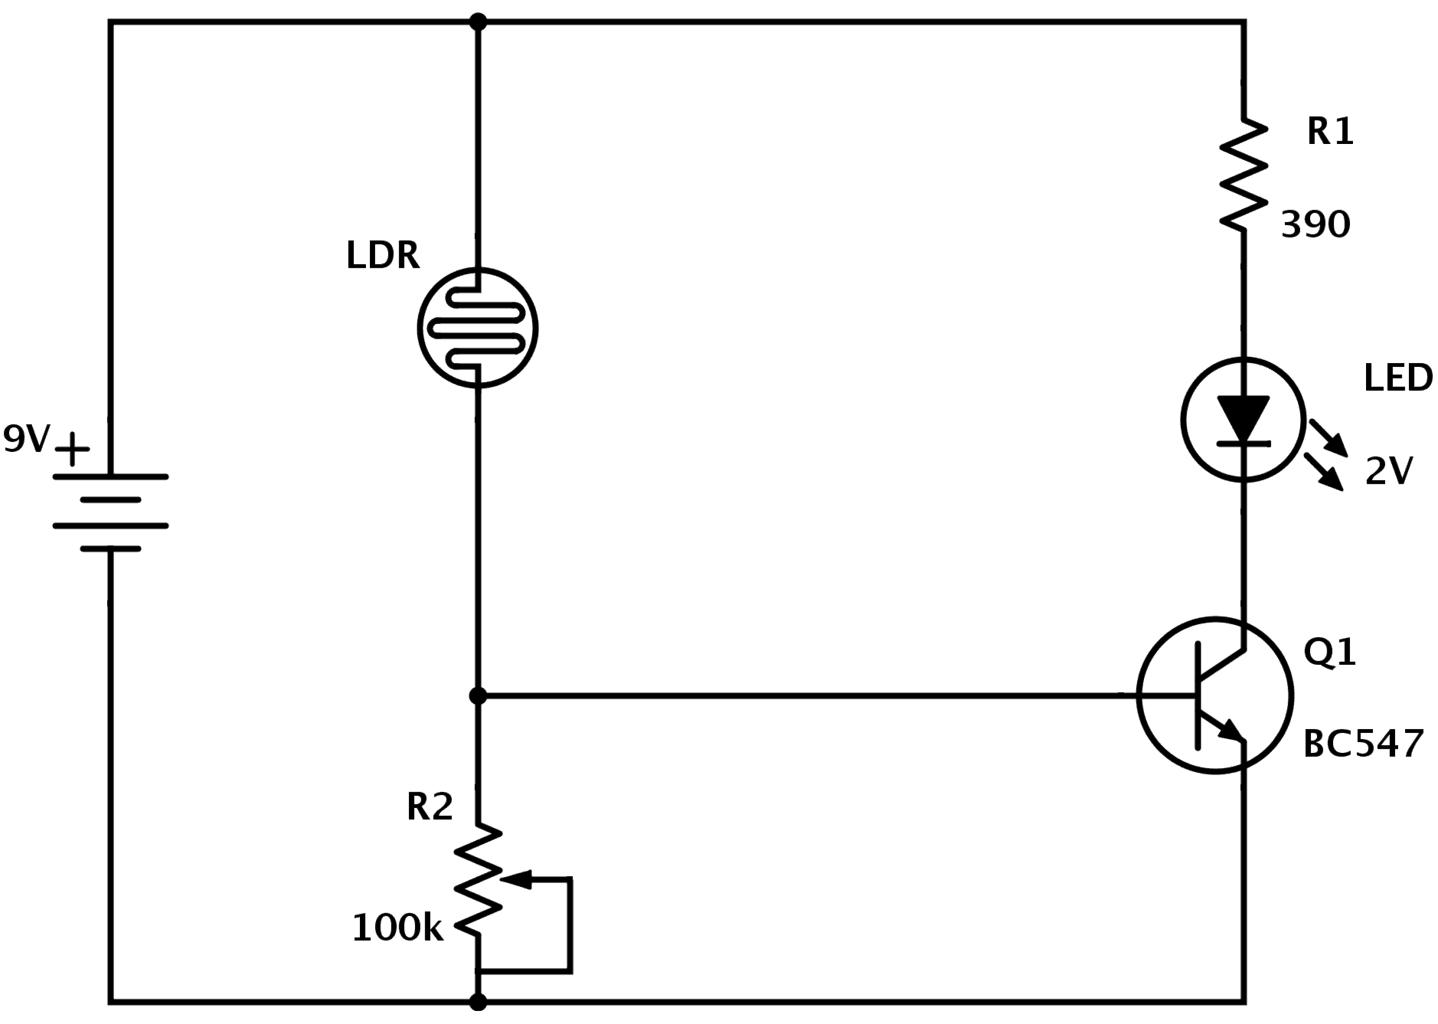 Basic Schematic Wiring Diagrams - Wiring Block Diagram - Schematic Wiring Diagram